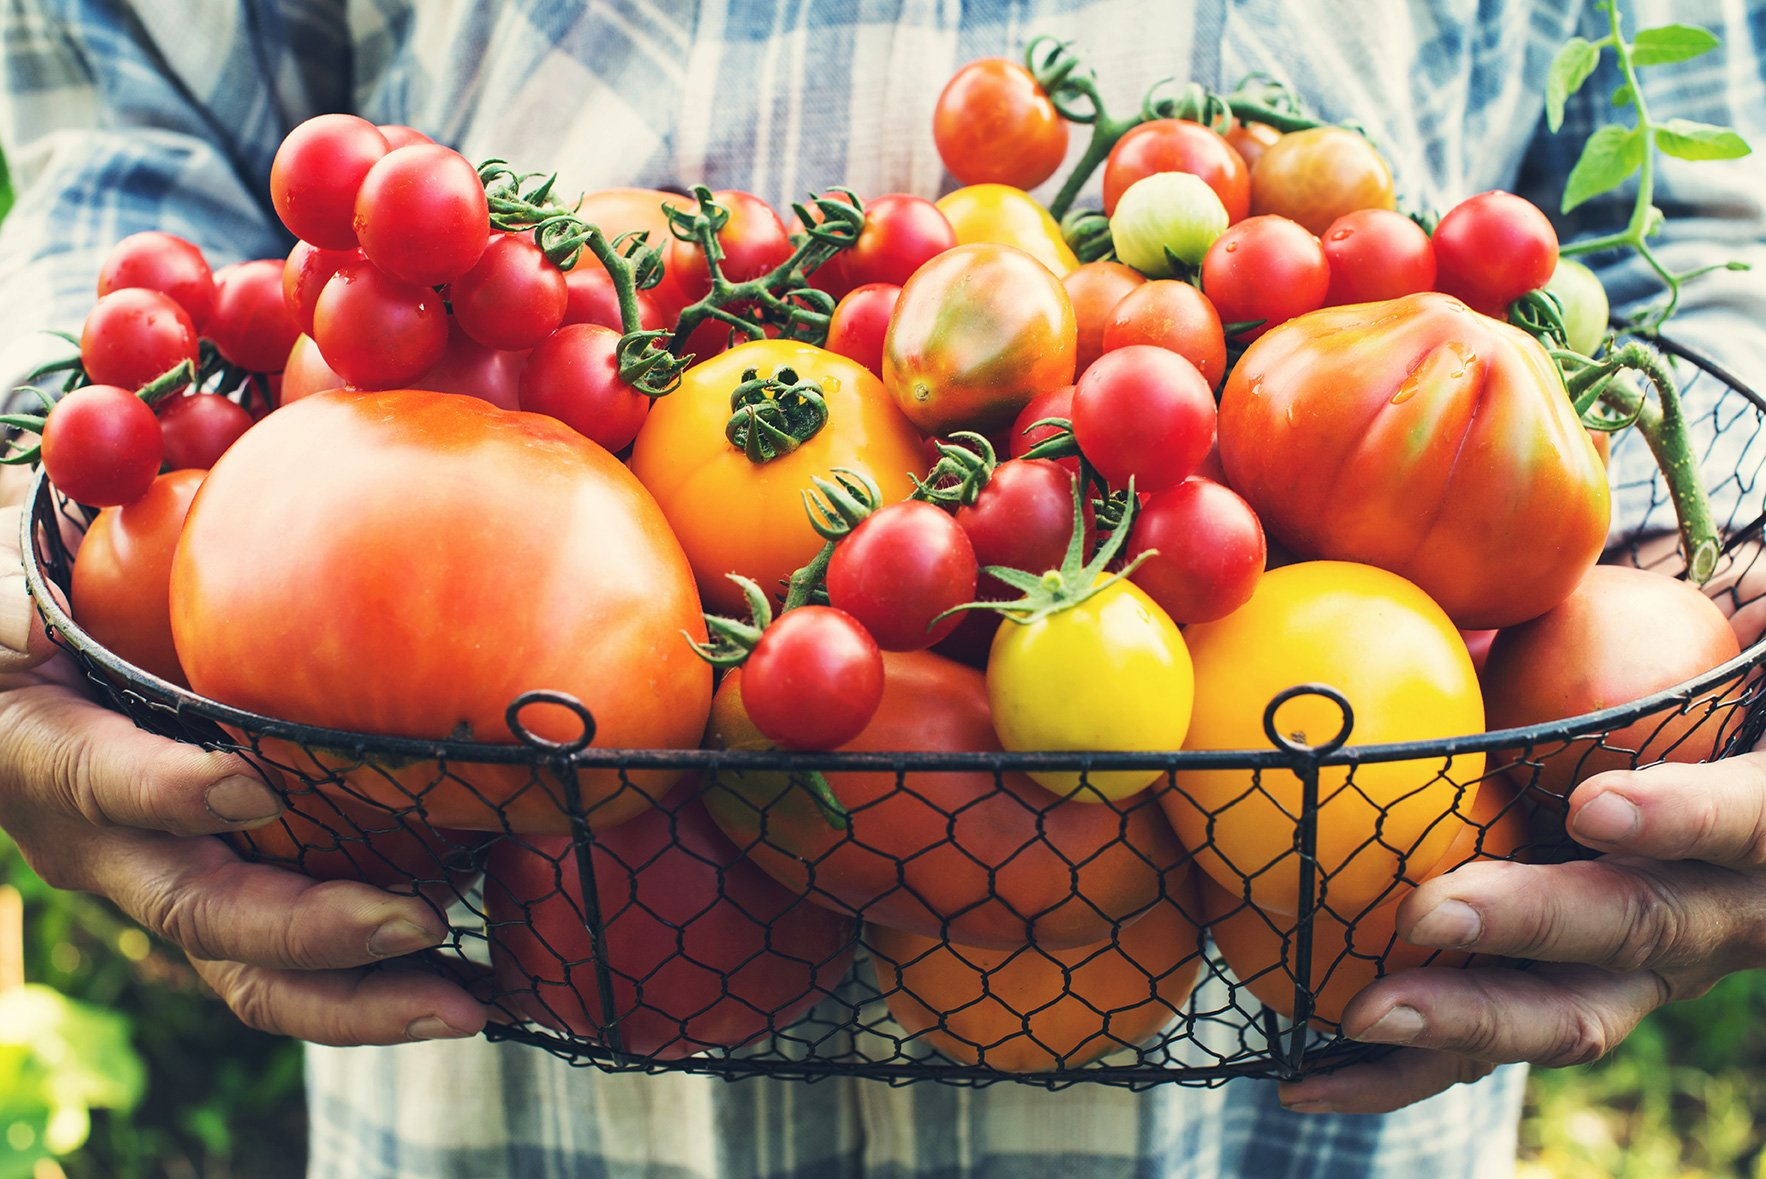 tomato yield gardening harvesting tomatoes